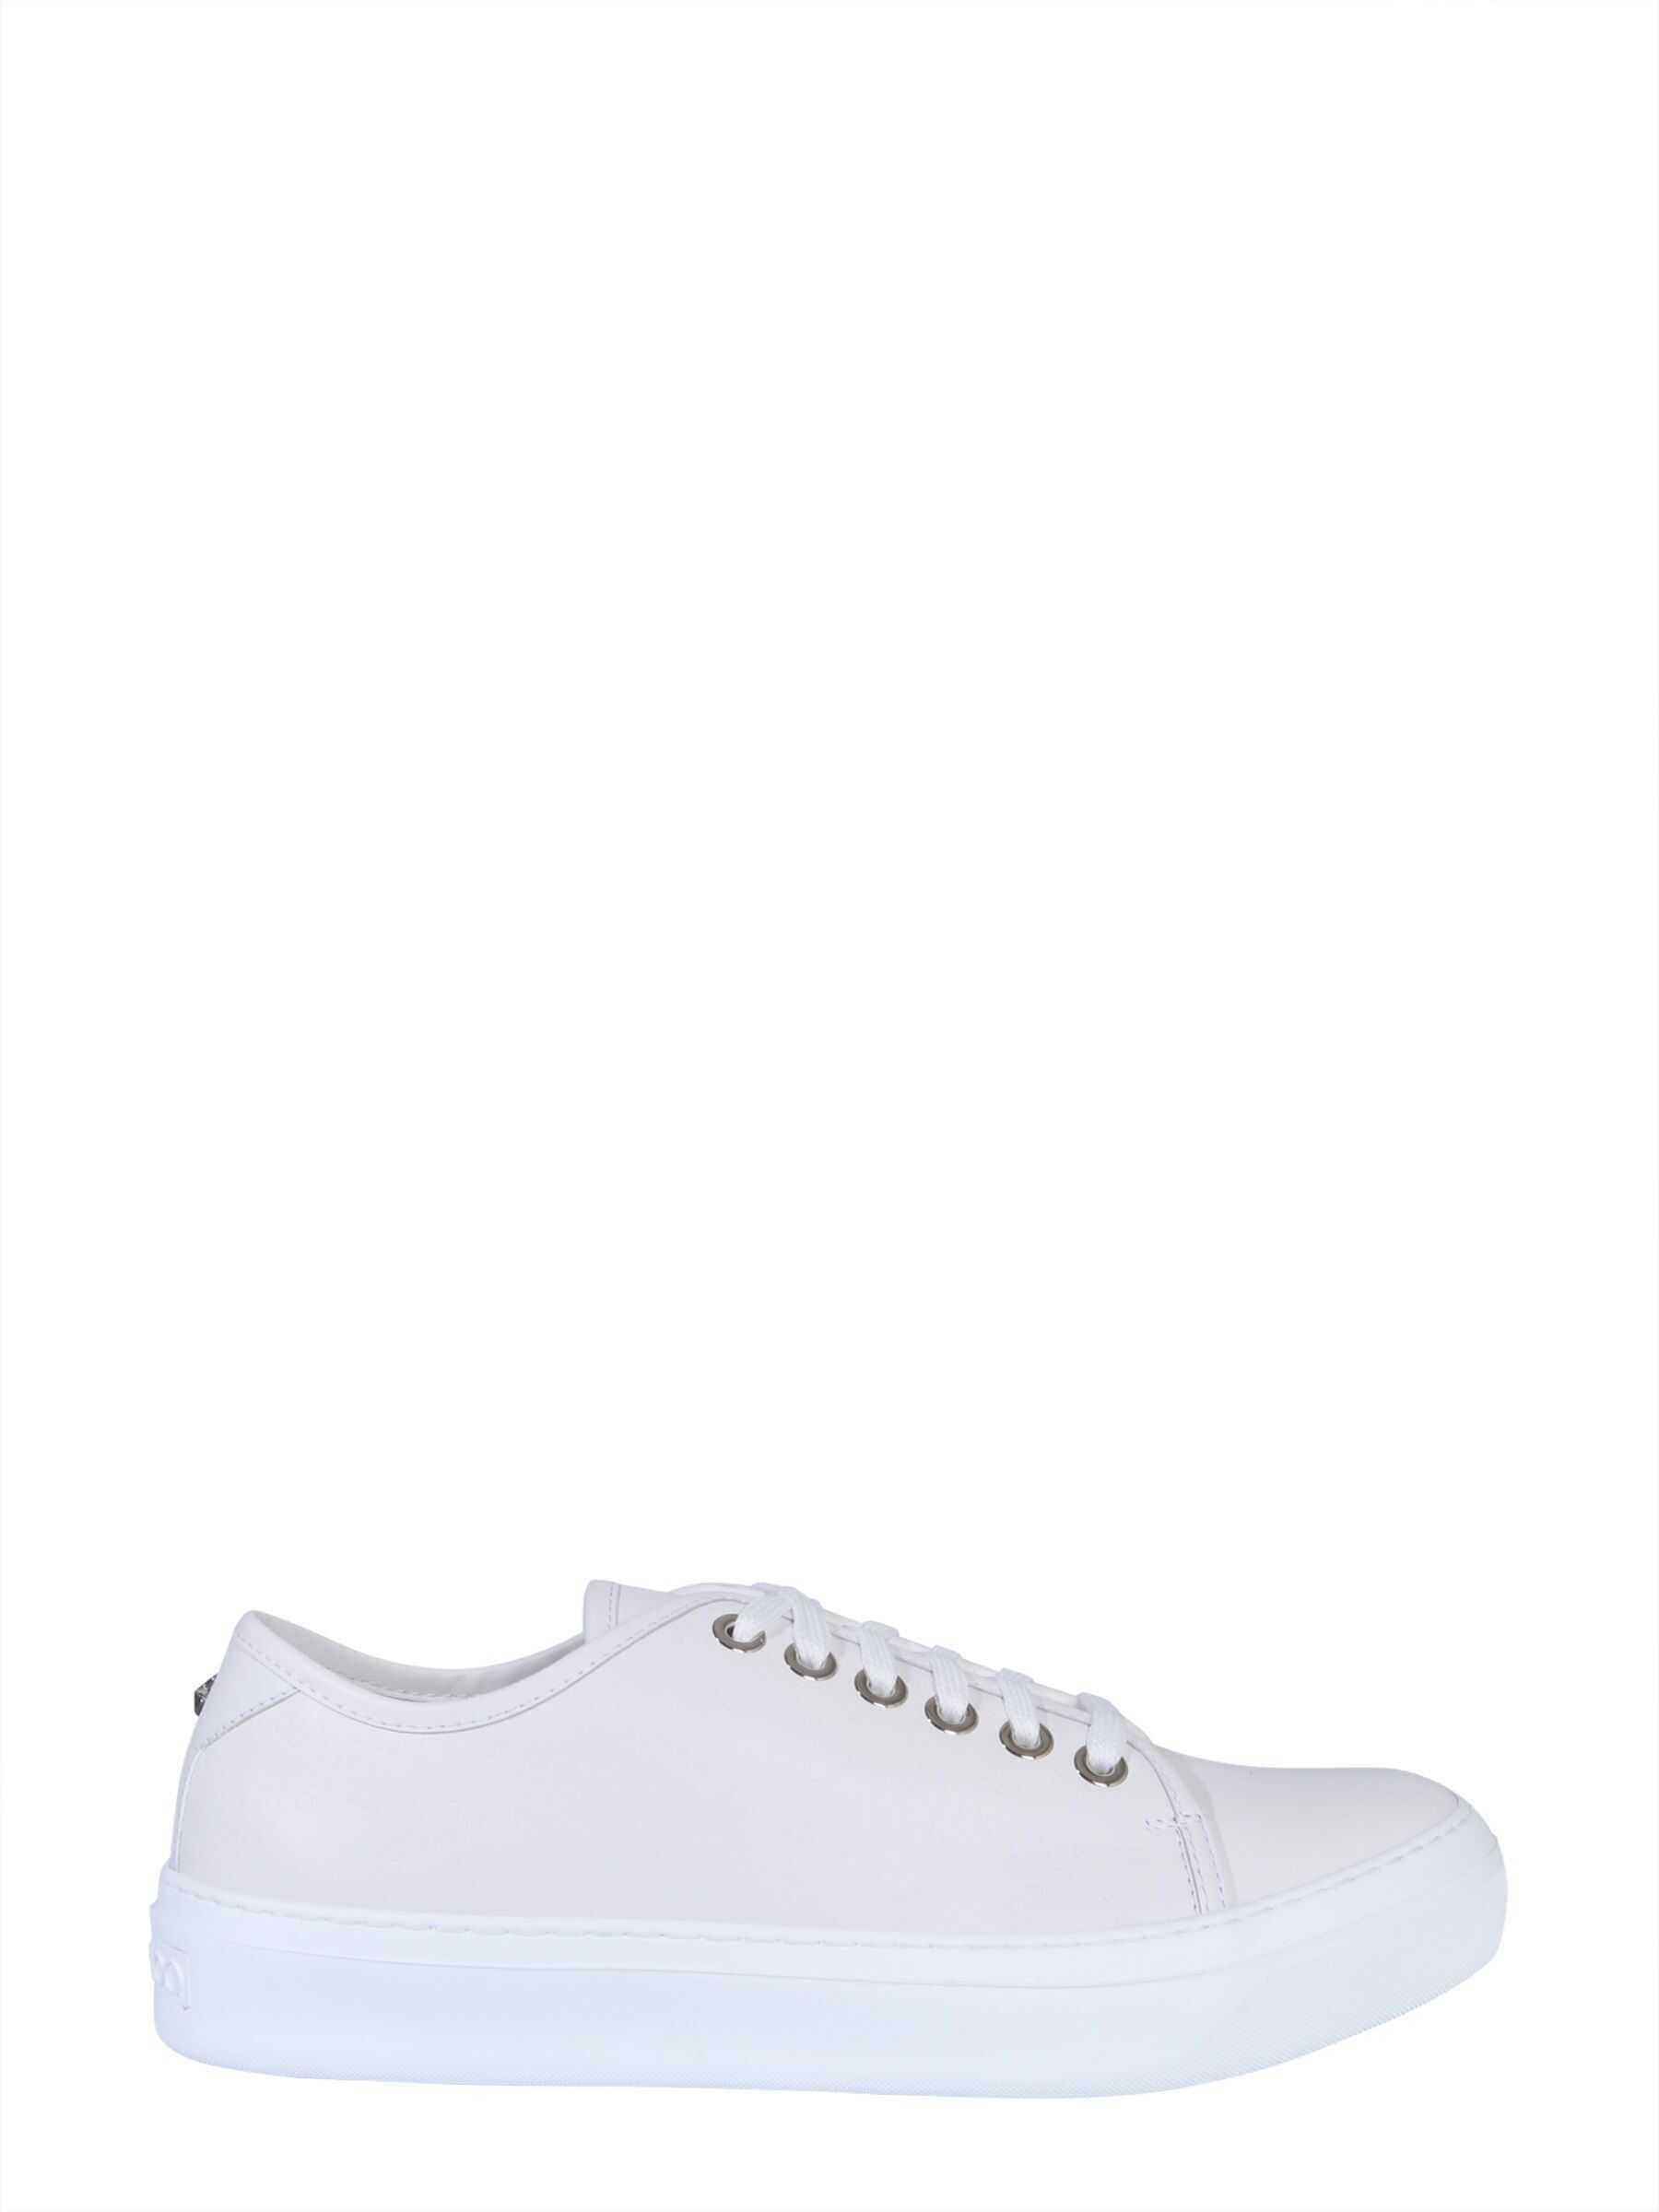 Aiden Sneakers thumbnail